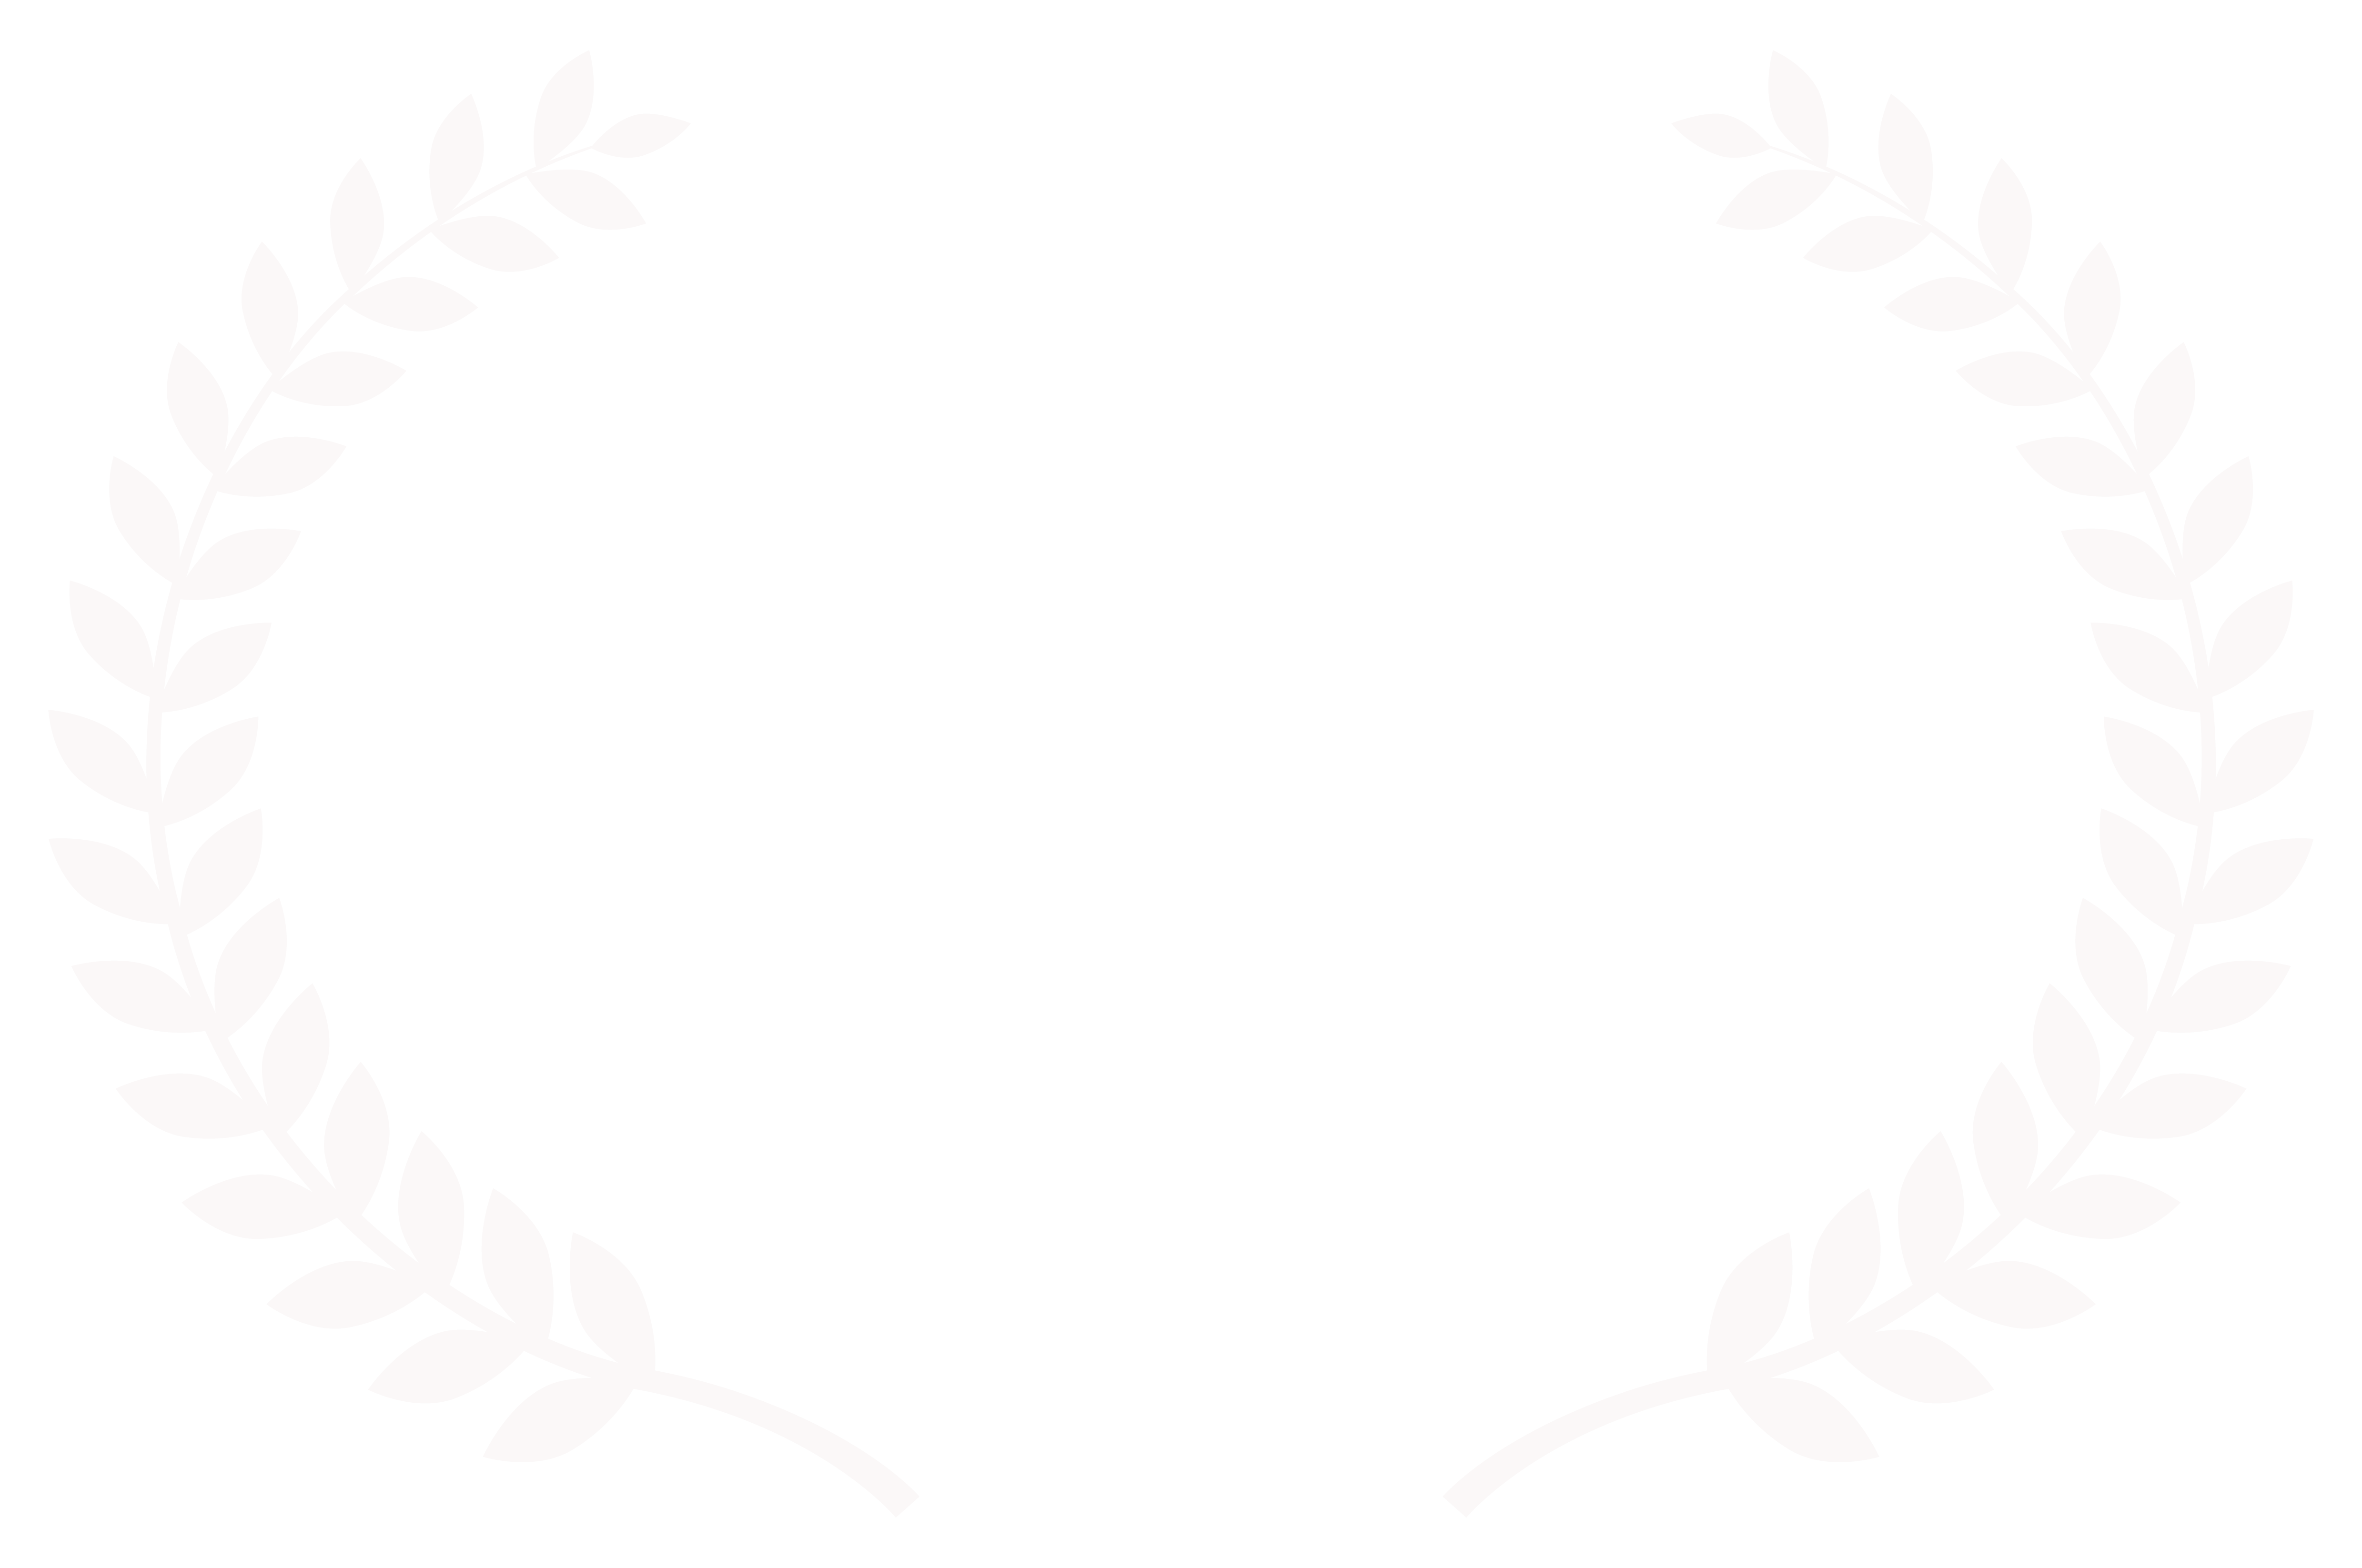 SECCION OFICIAL BaiDeFest 2018 (N)